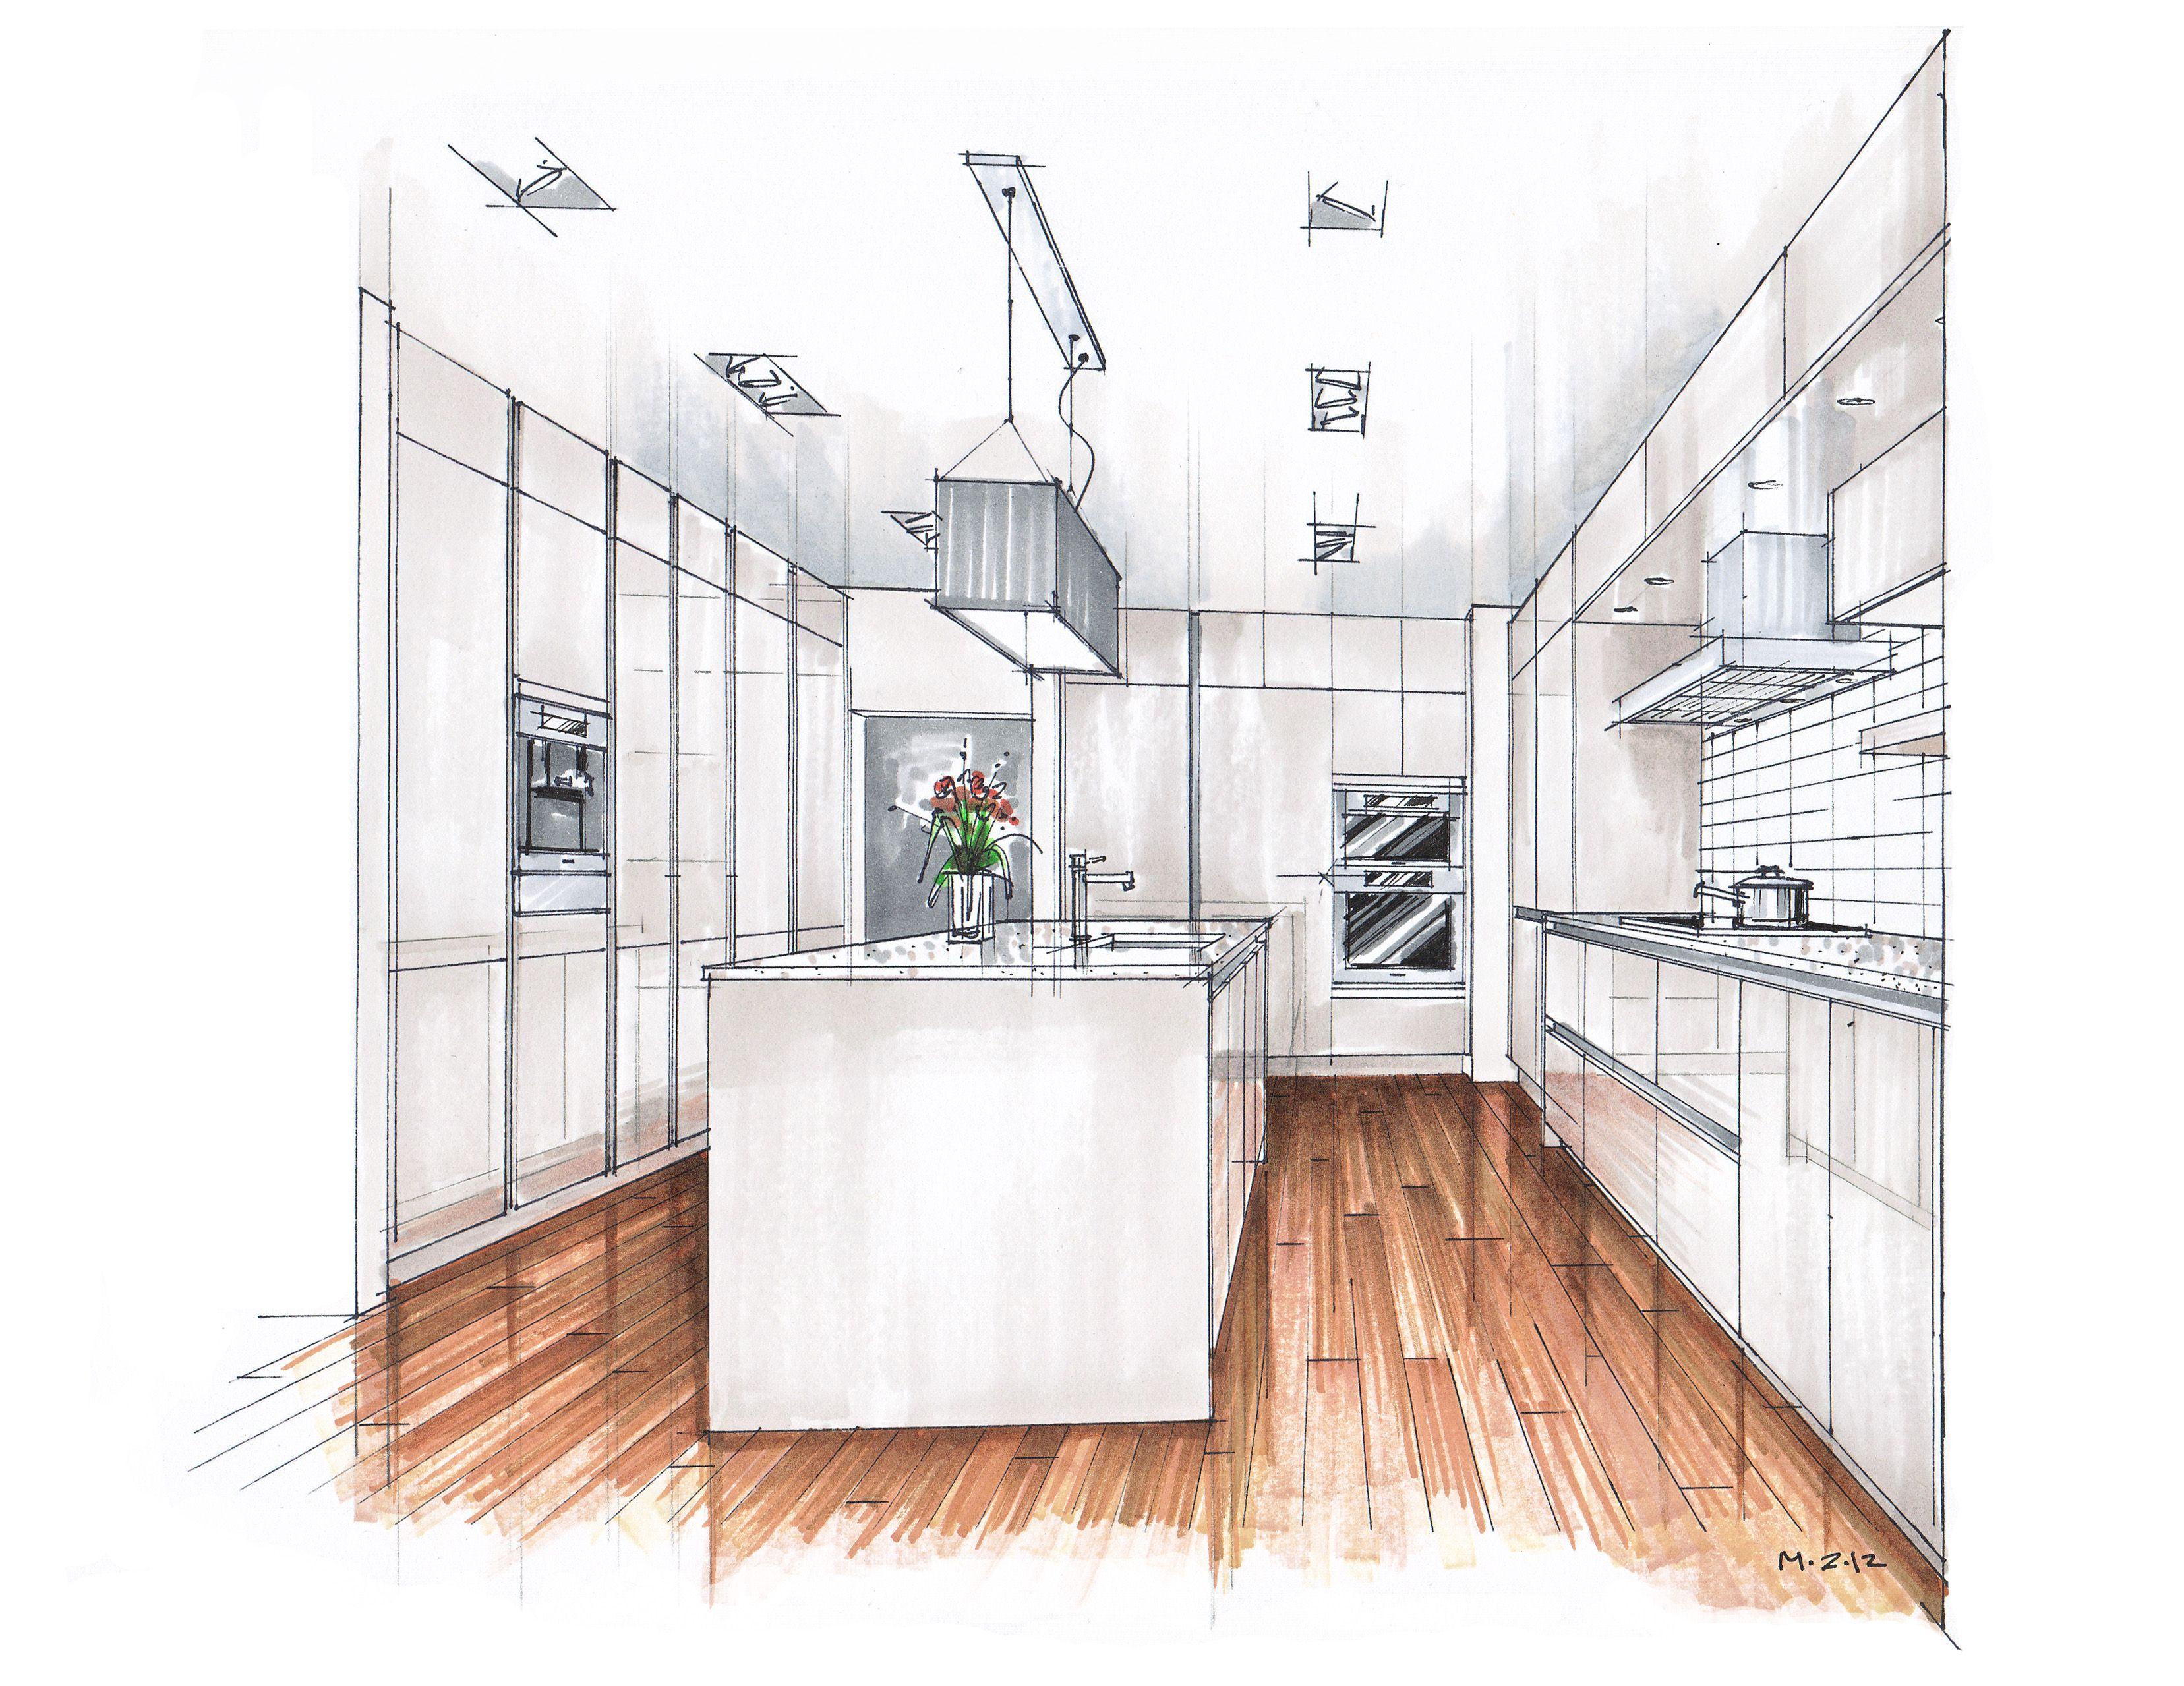 Inspirational kitchen marker rendering google search for Interior designs kitchen sketches